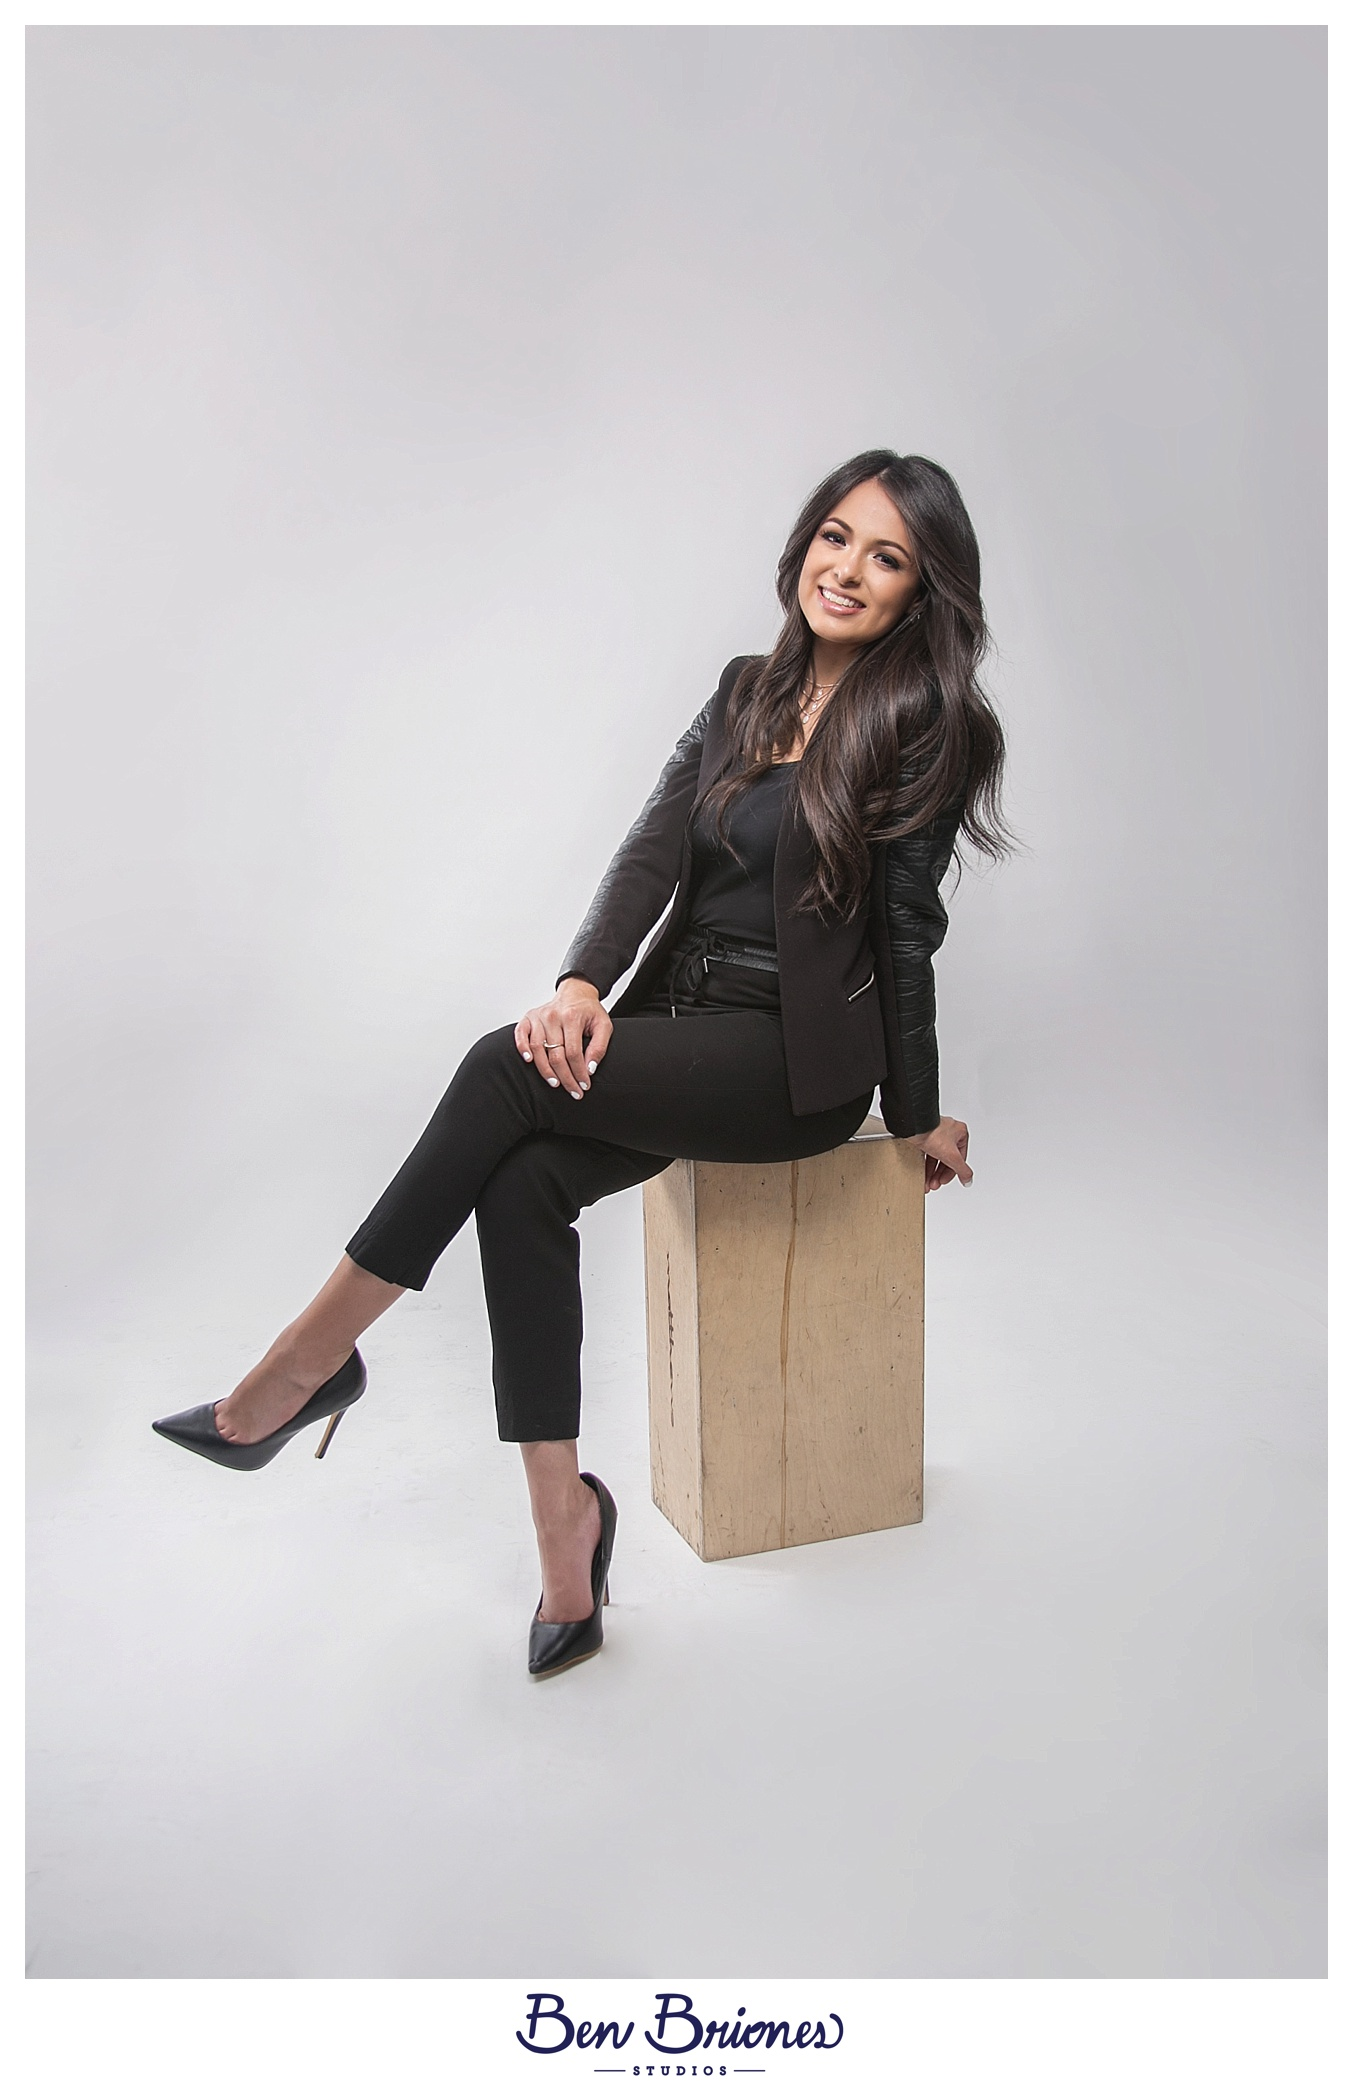 08.12.17_PRINT_Georgette Rojas Portraits_BBS-4983_pp_BLOG